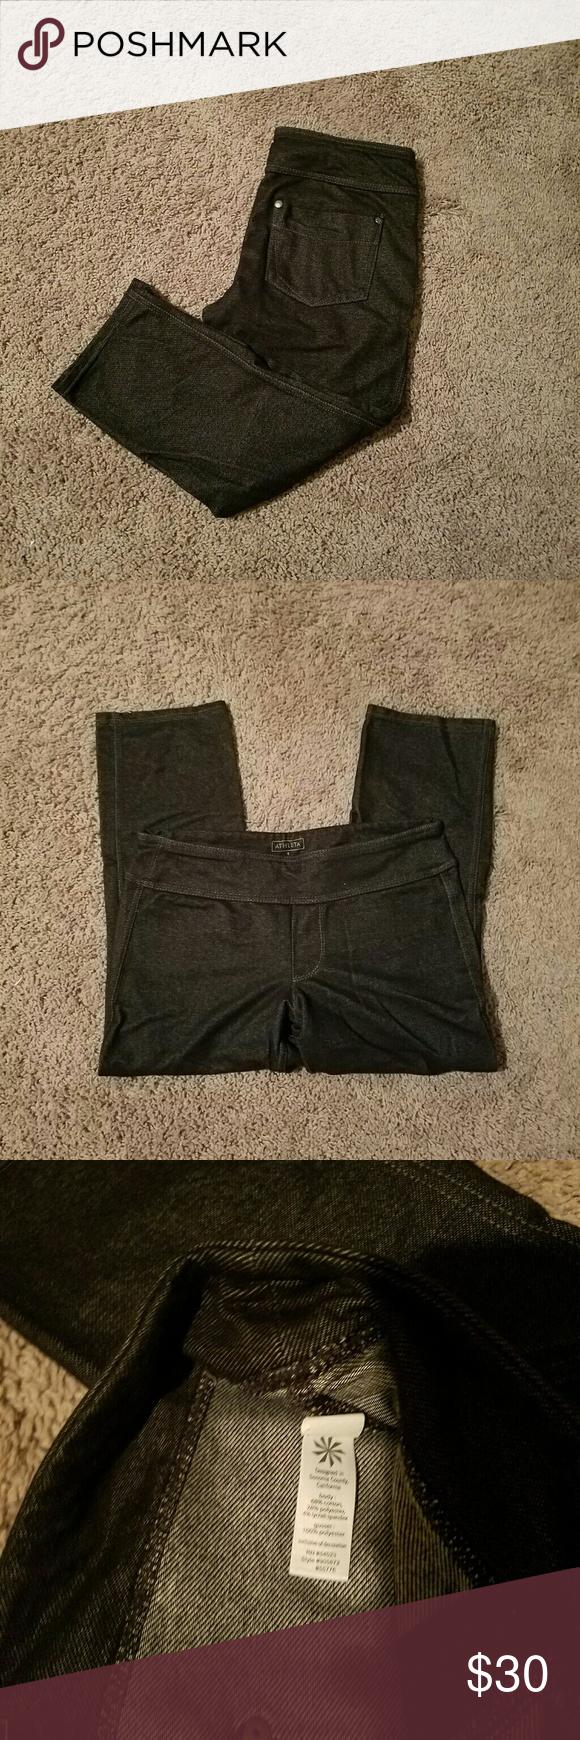 Athleta capris Athleta capris, denim look, back pockets, great condition Athleta Pants Capris